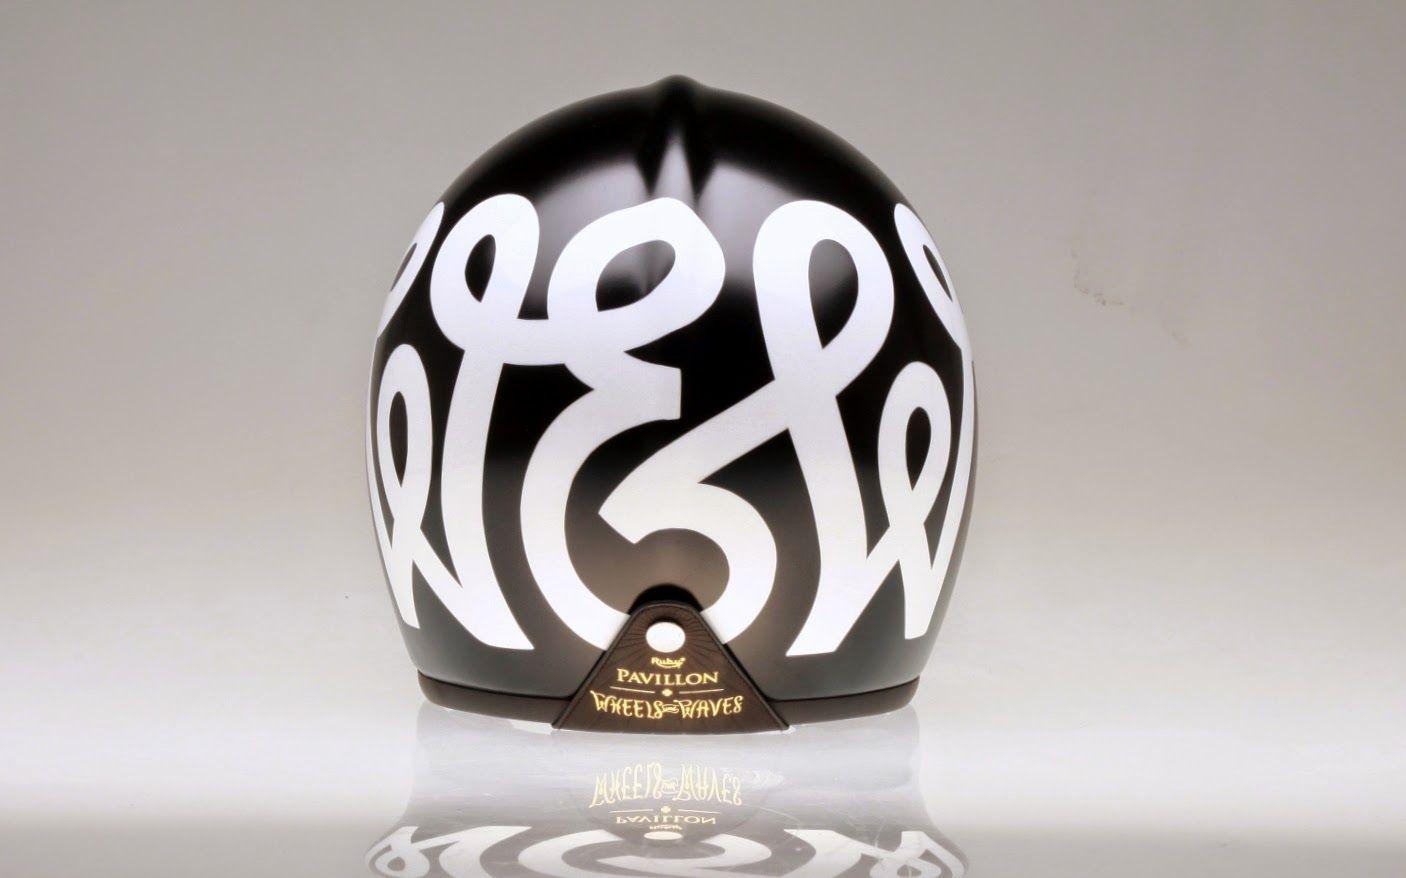 Ruby pavillon wheels waves via moto mucci painted helmets